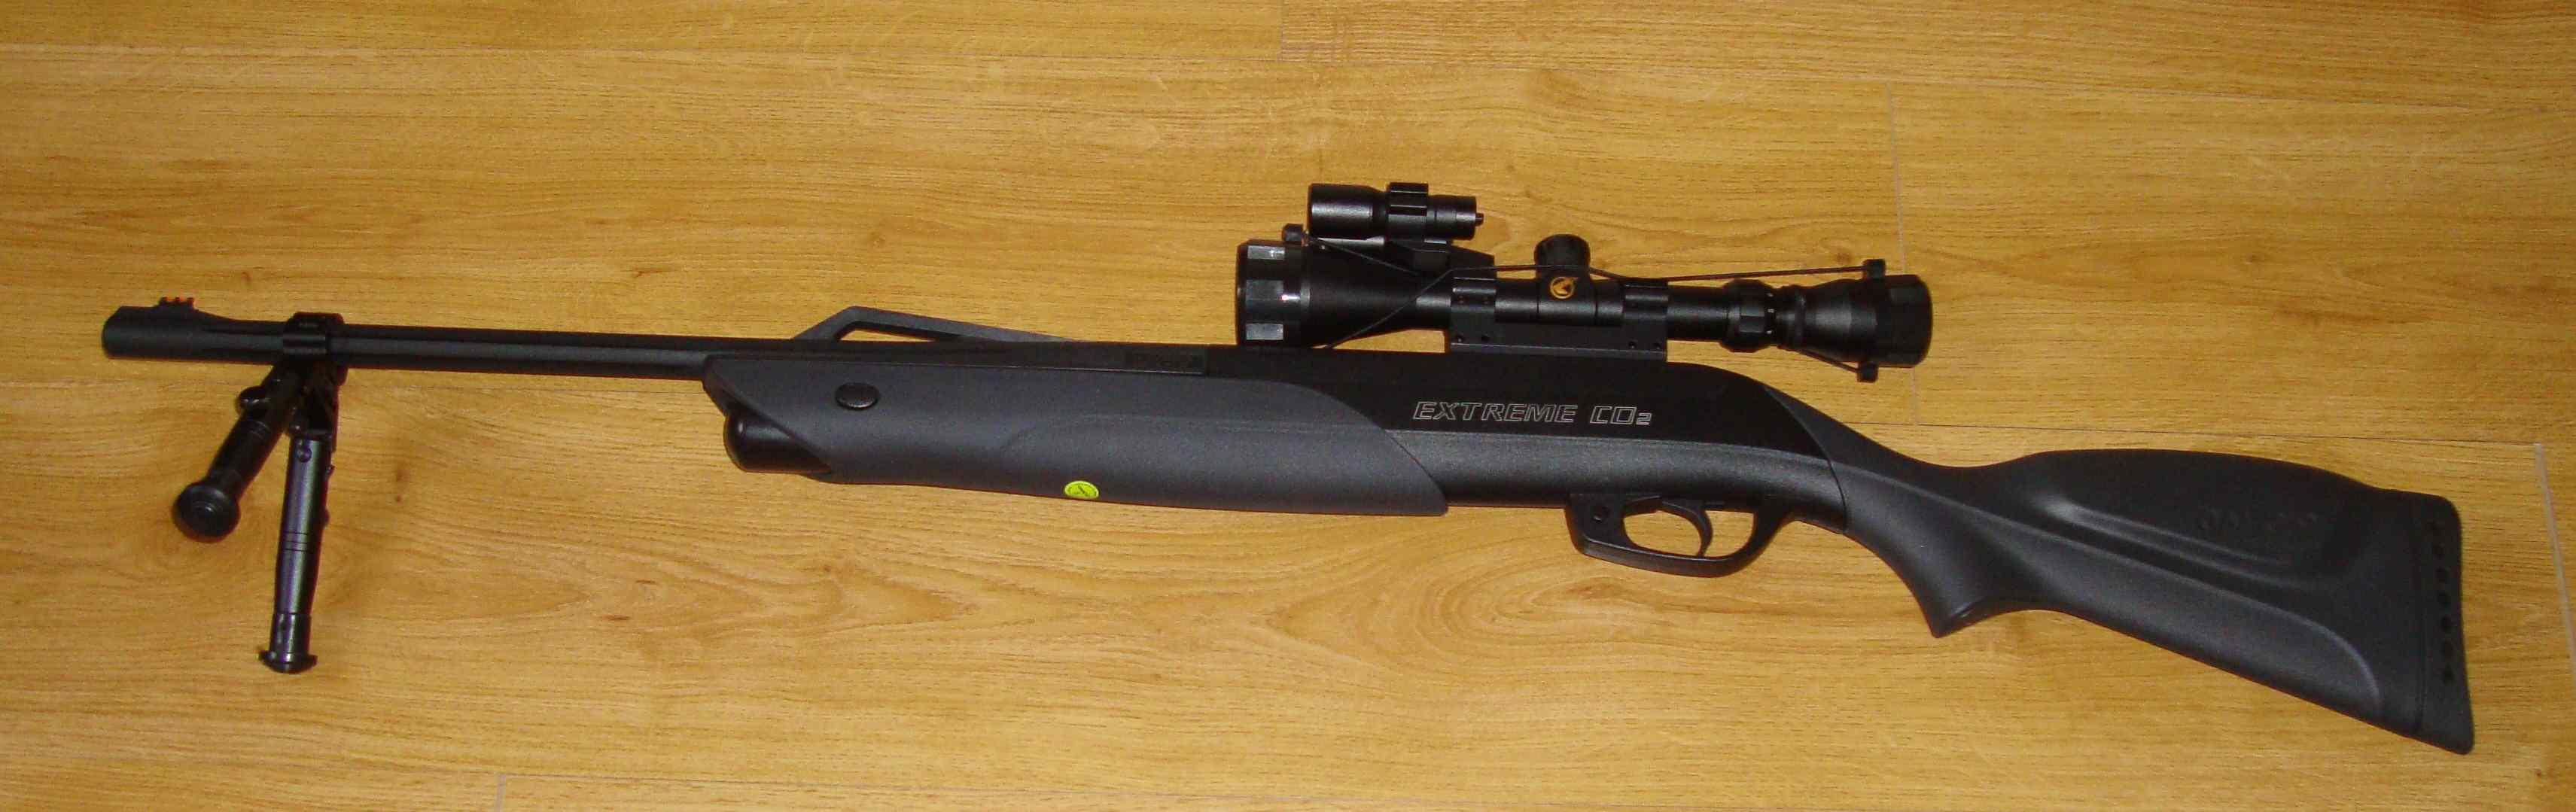 File:Gamo Extreme CO2 air gun jpg - Wikimedia Commons